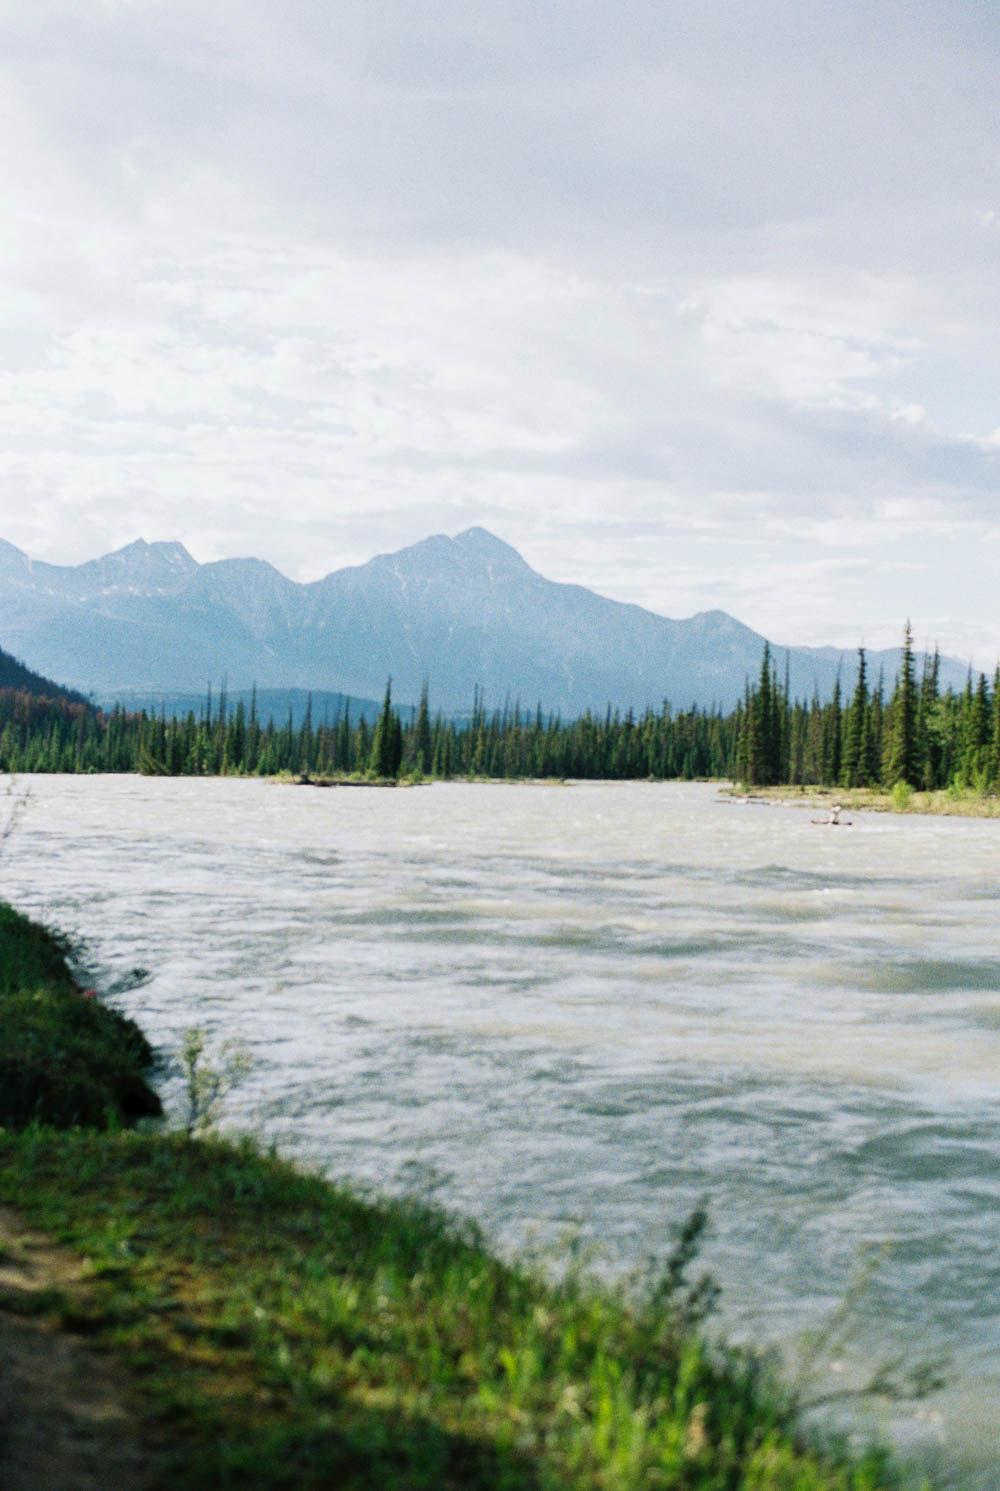 © Cottage Hill, LLC | cottagehill.co | Canadian Rockies1.jpg